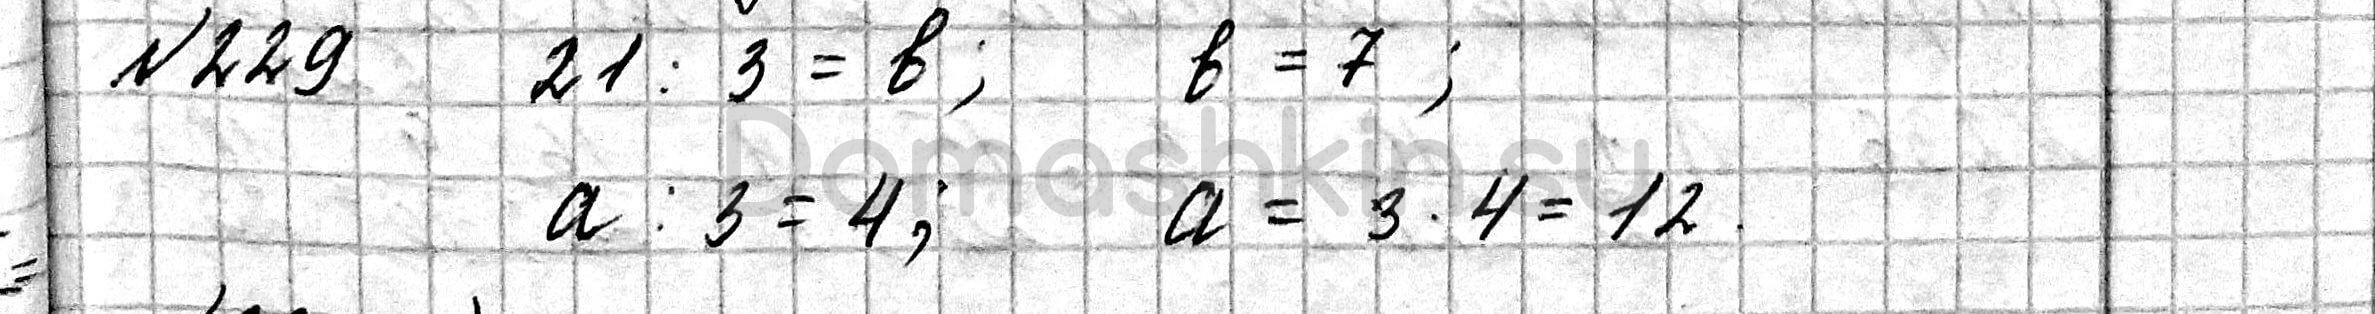 Математика 6 класс учебник Мерзляк номер 229 решение